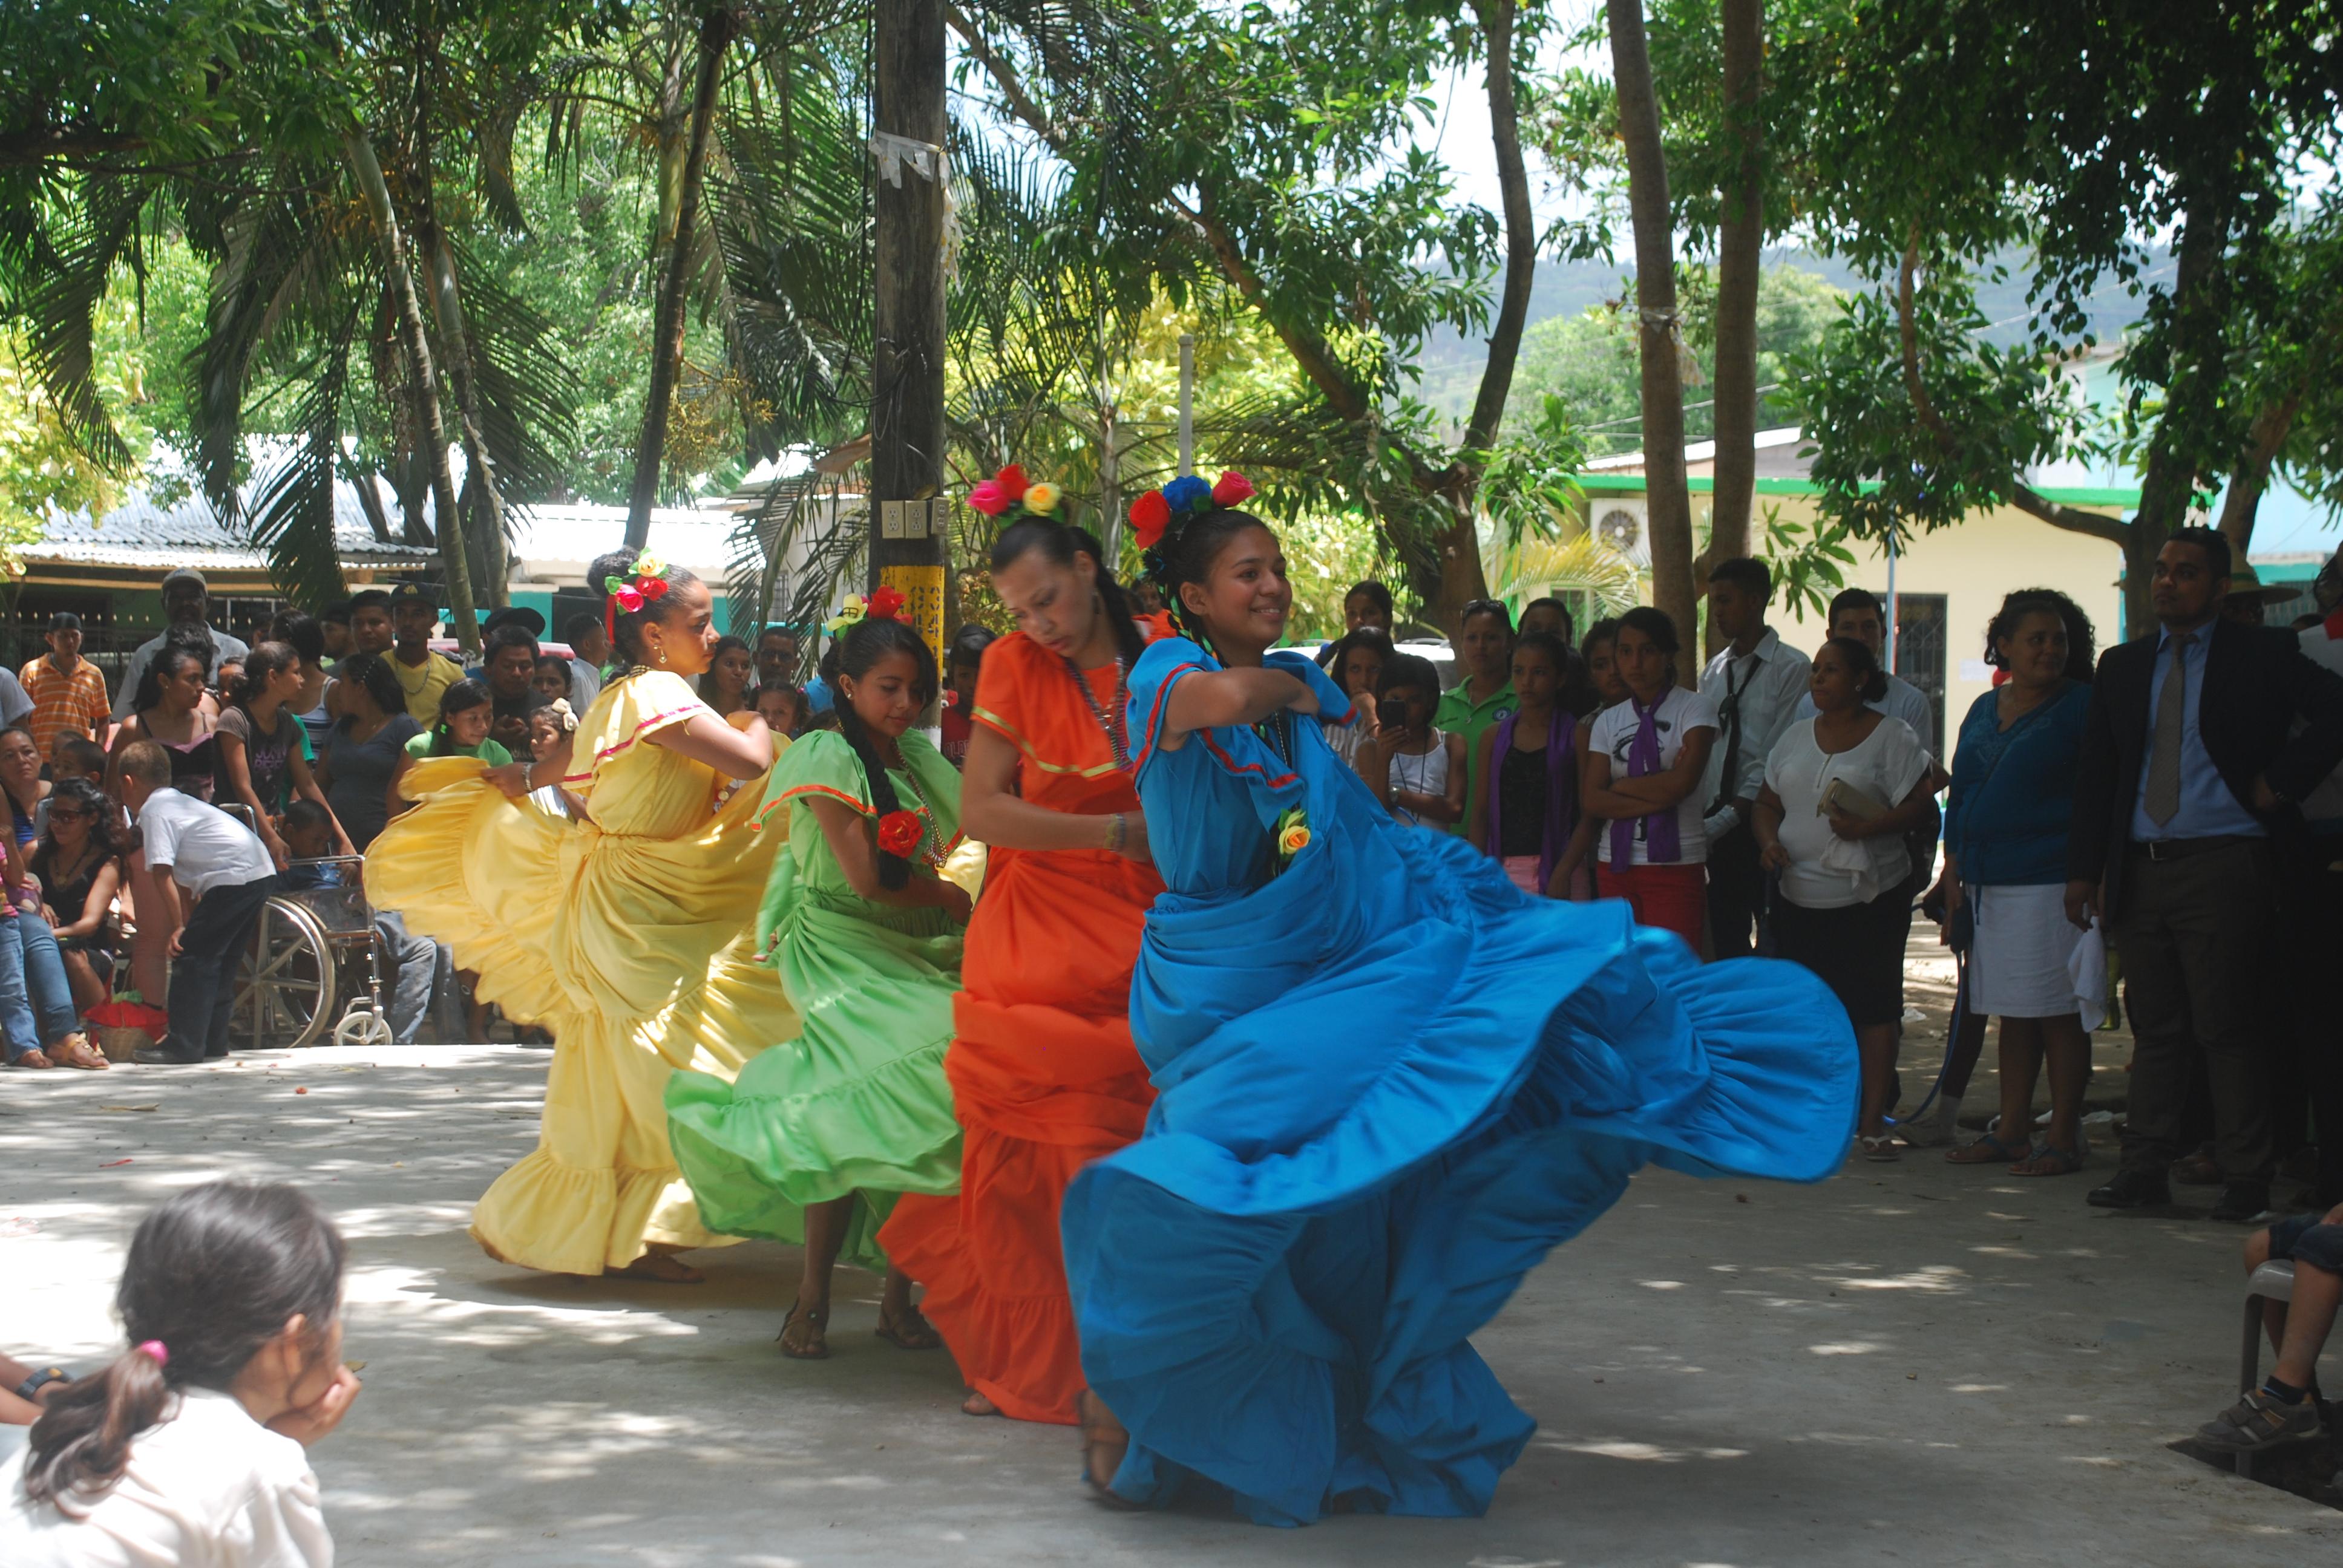 honduras independence choice image